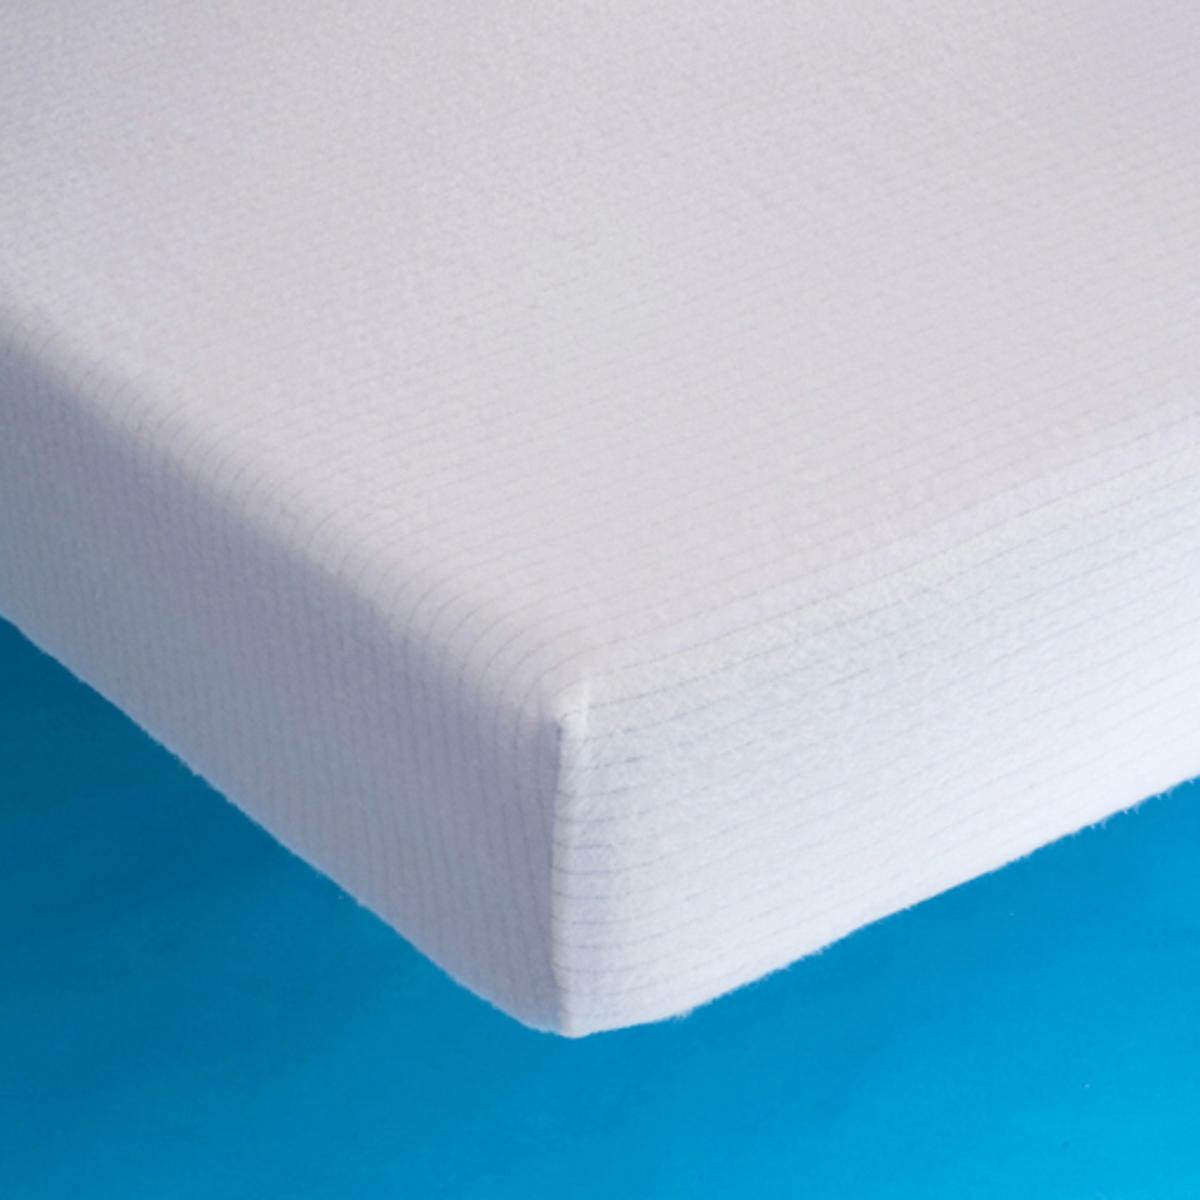 Защитный чехол для матраса из мольтона чехол защитный на матрас из мольтона 220 г м²